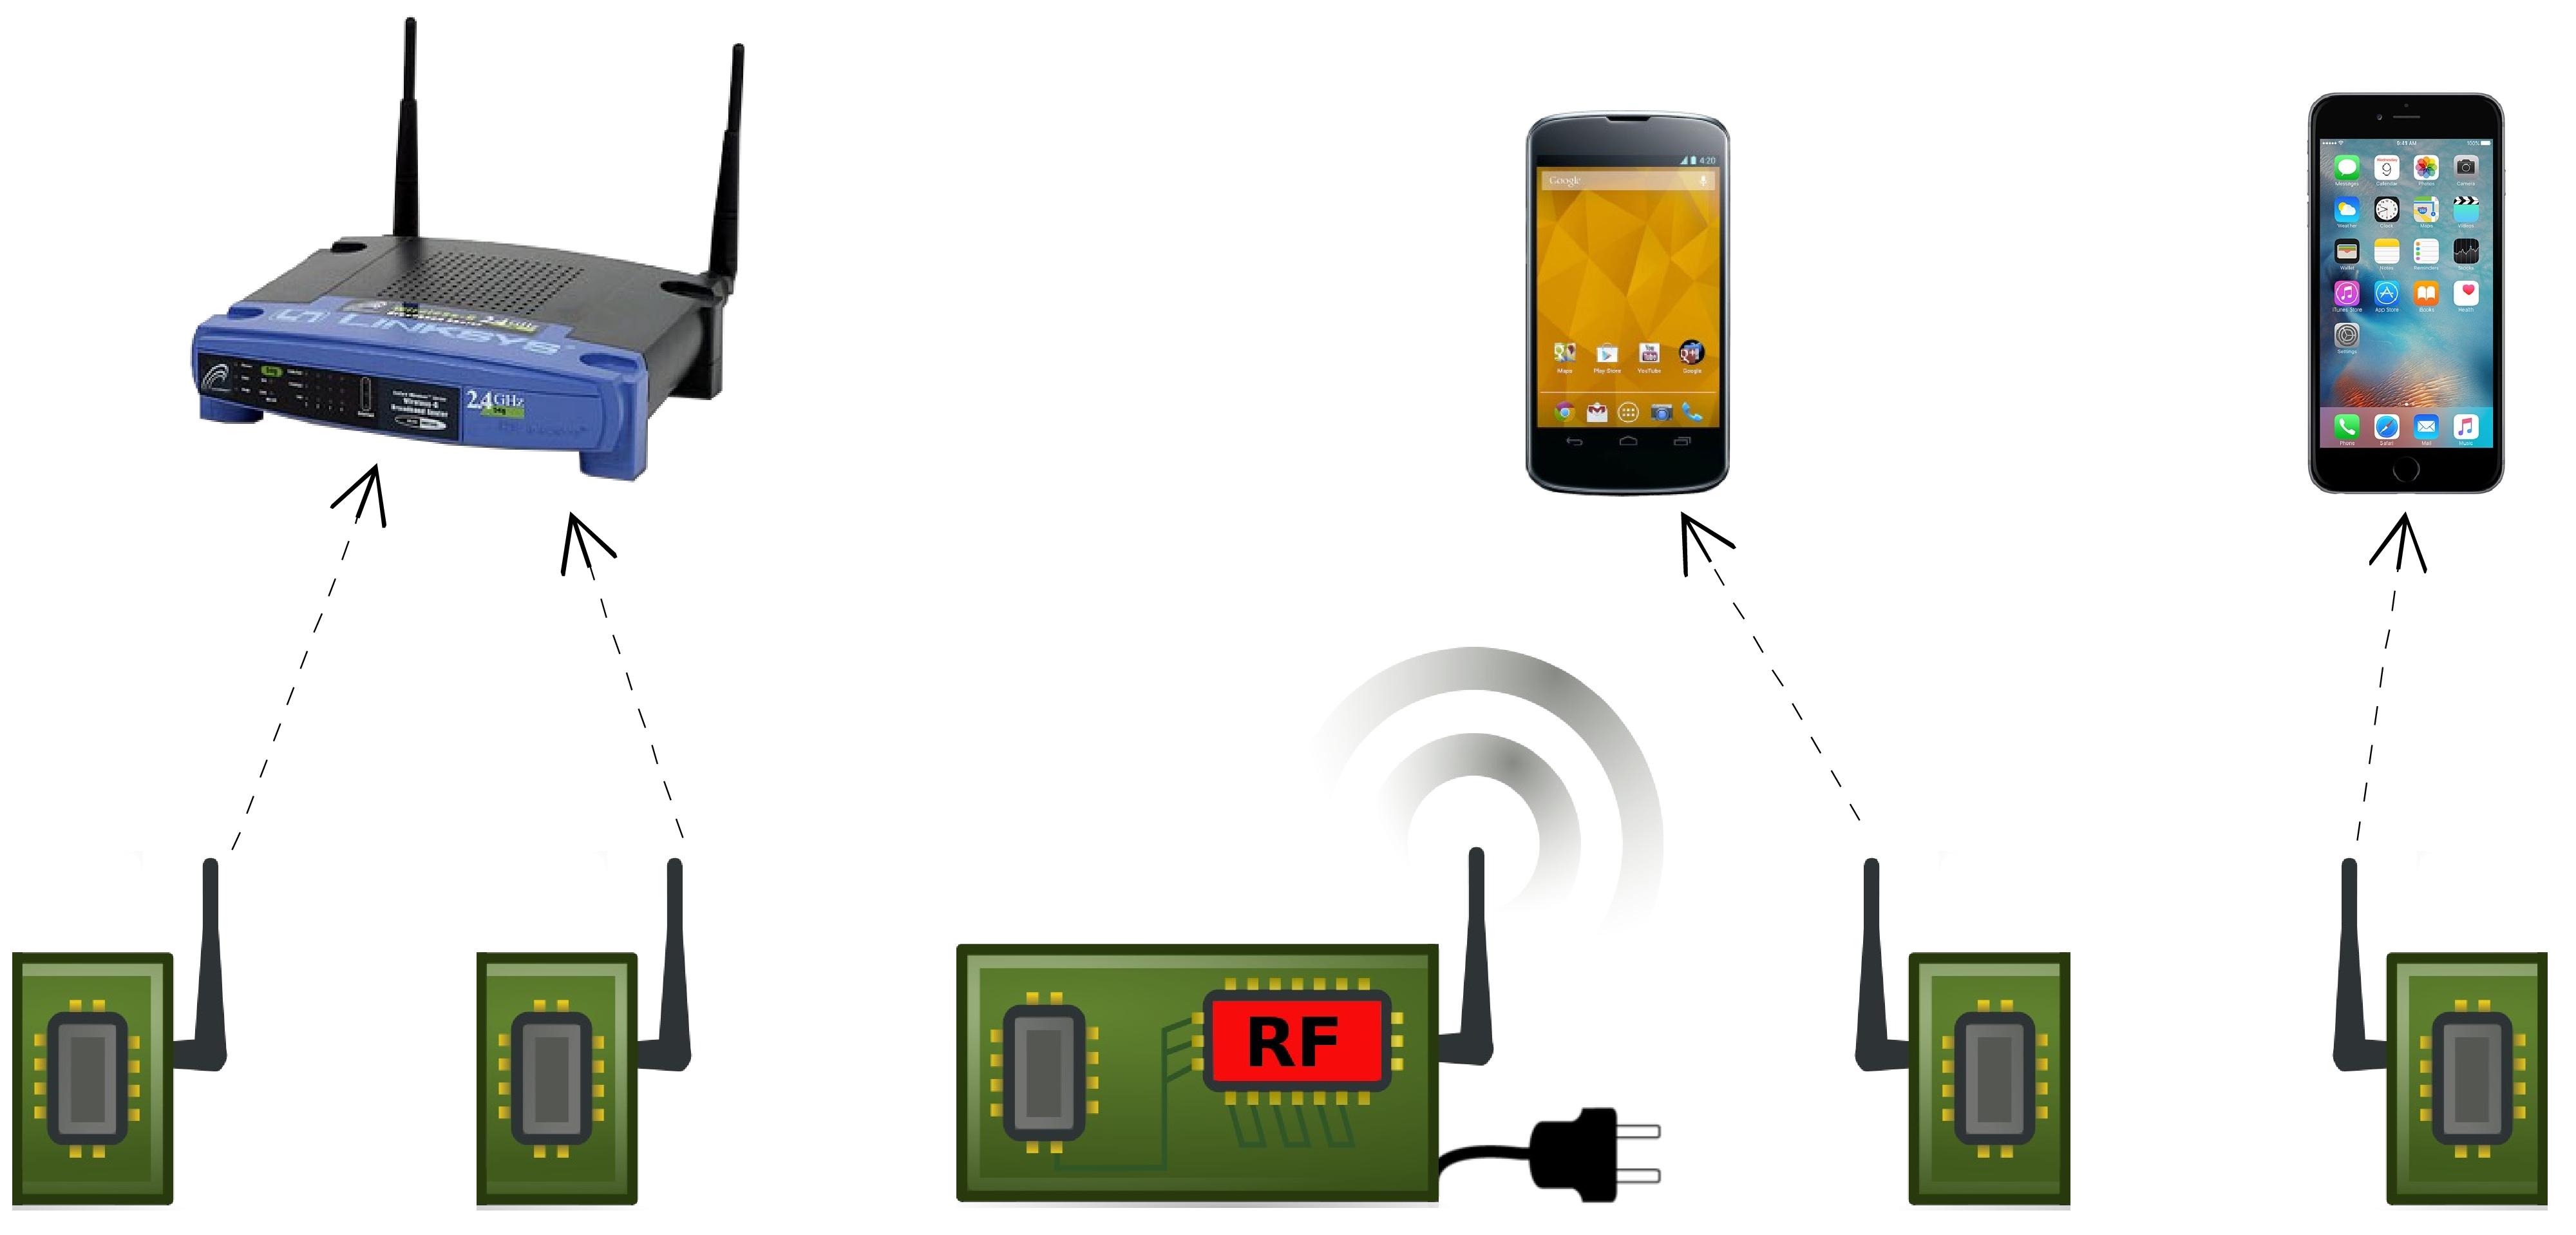 Pasywne Wi-Fi